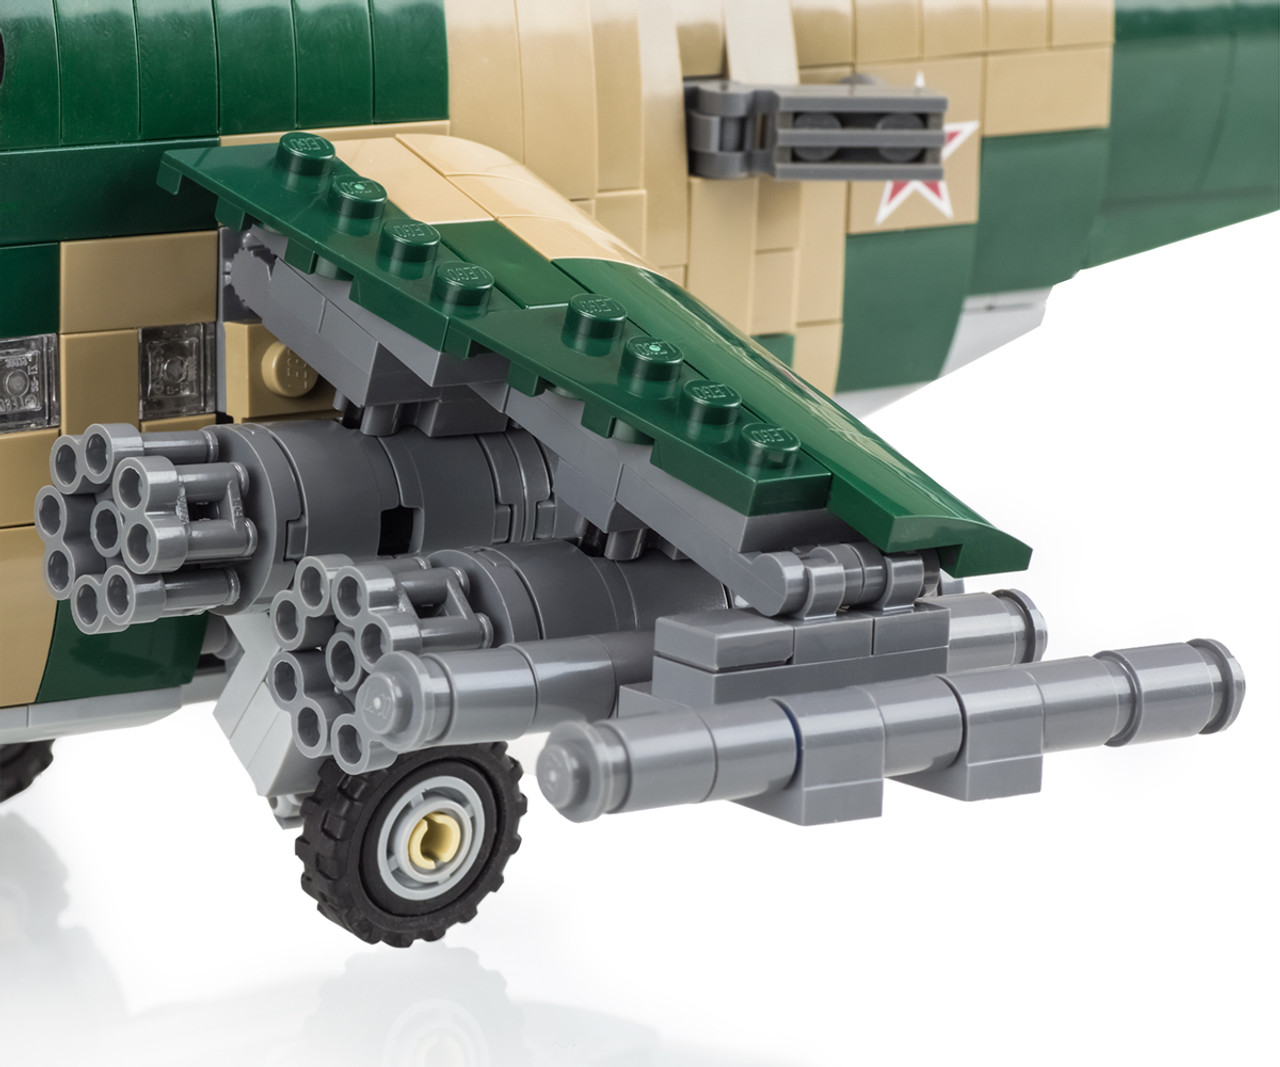 Mi 24 Hind Attack Helicopter Brickmania Toys